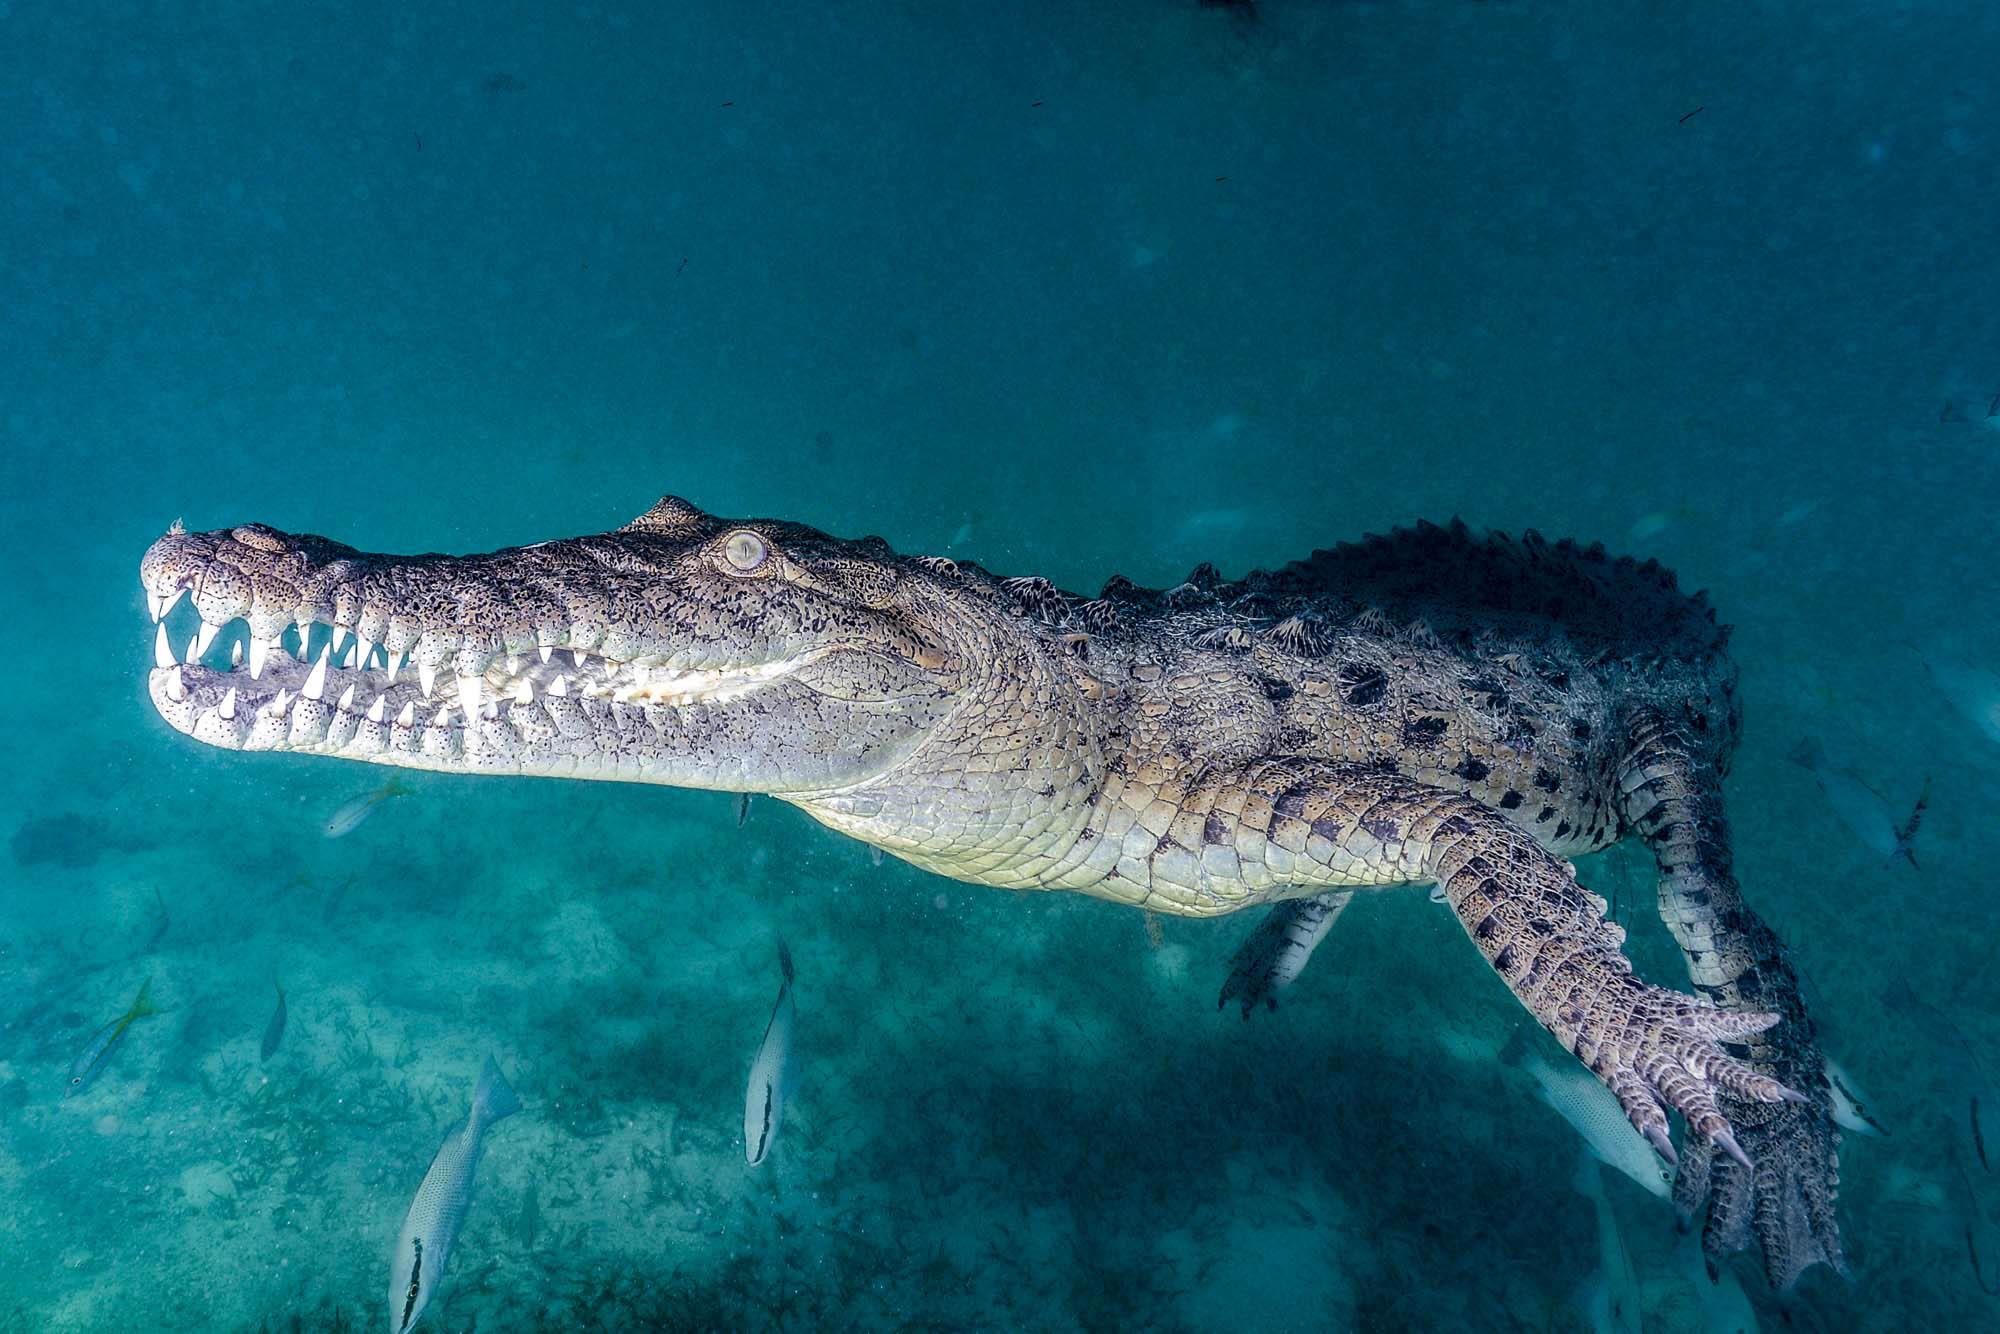 CROCODILES IN CUBA CREDIT: DAVID GROSS / coral reef image bank